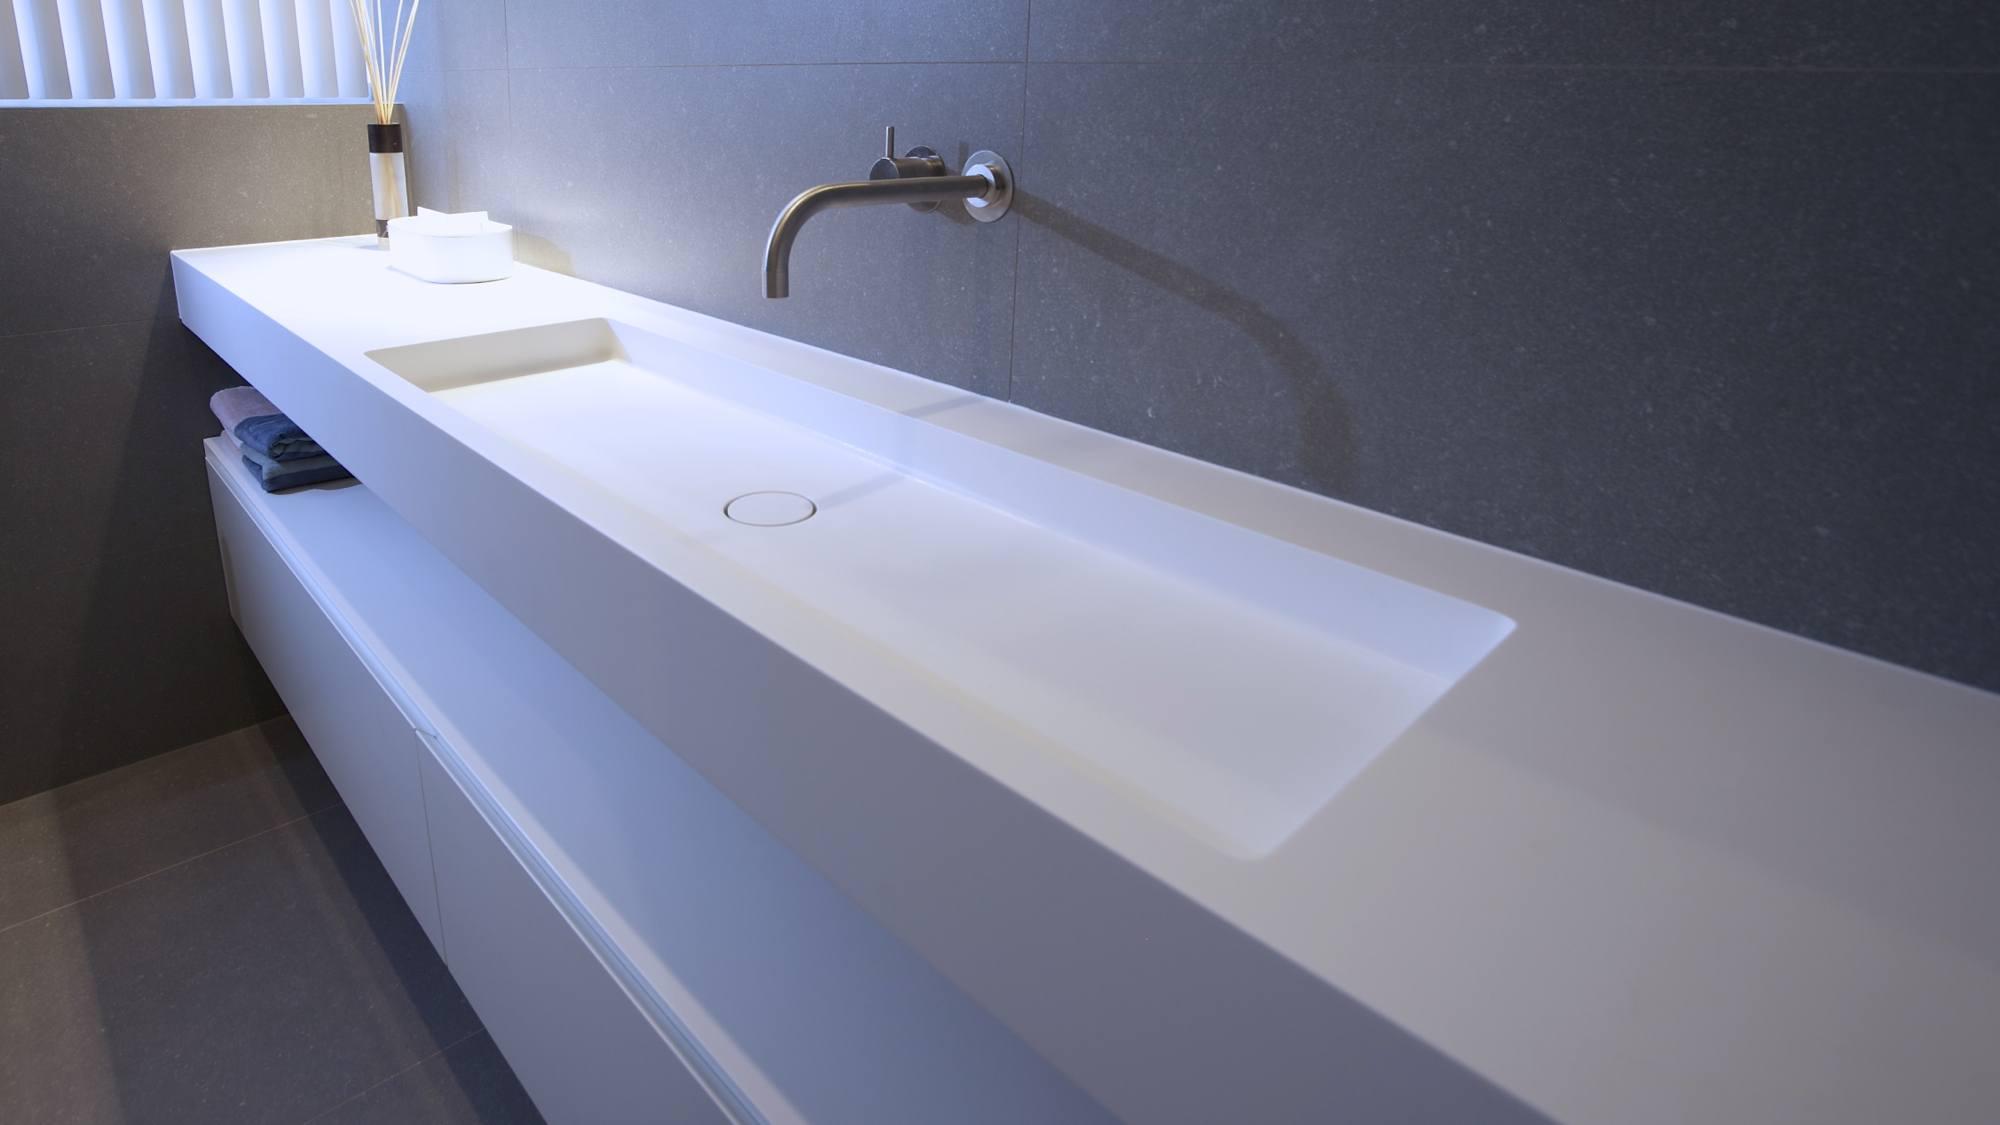 Corain Sink 3.jpg